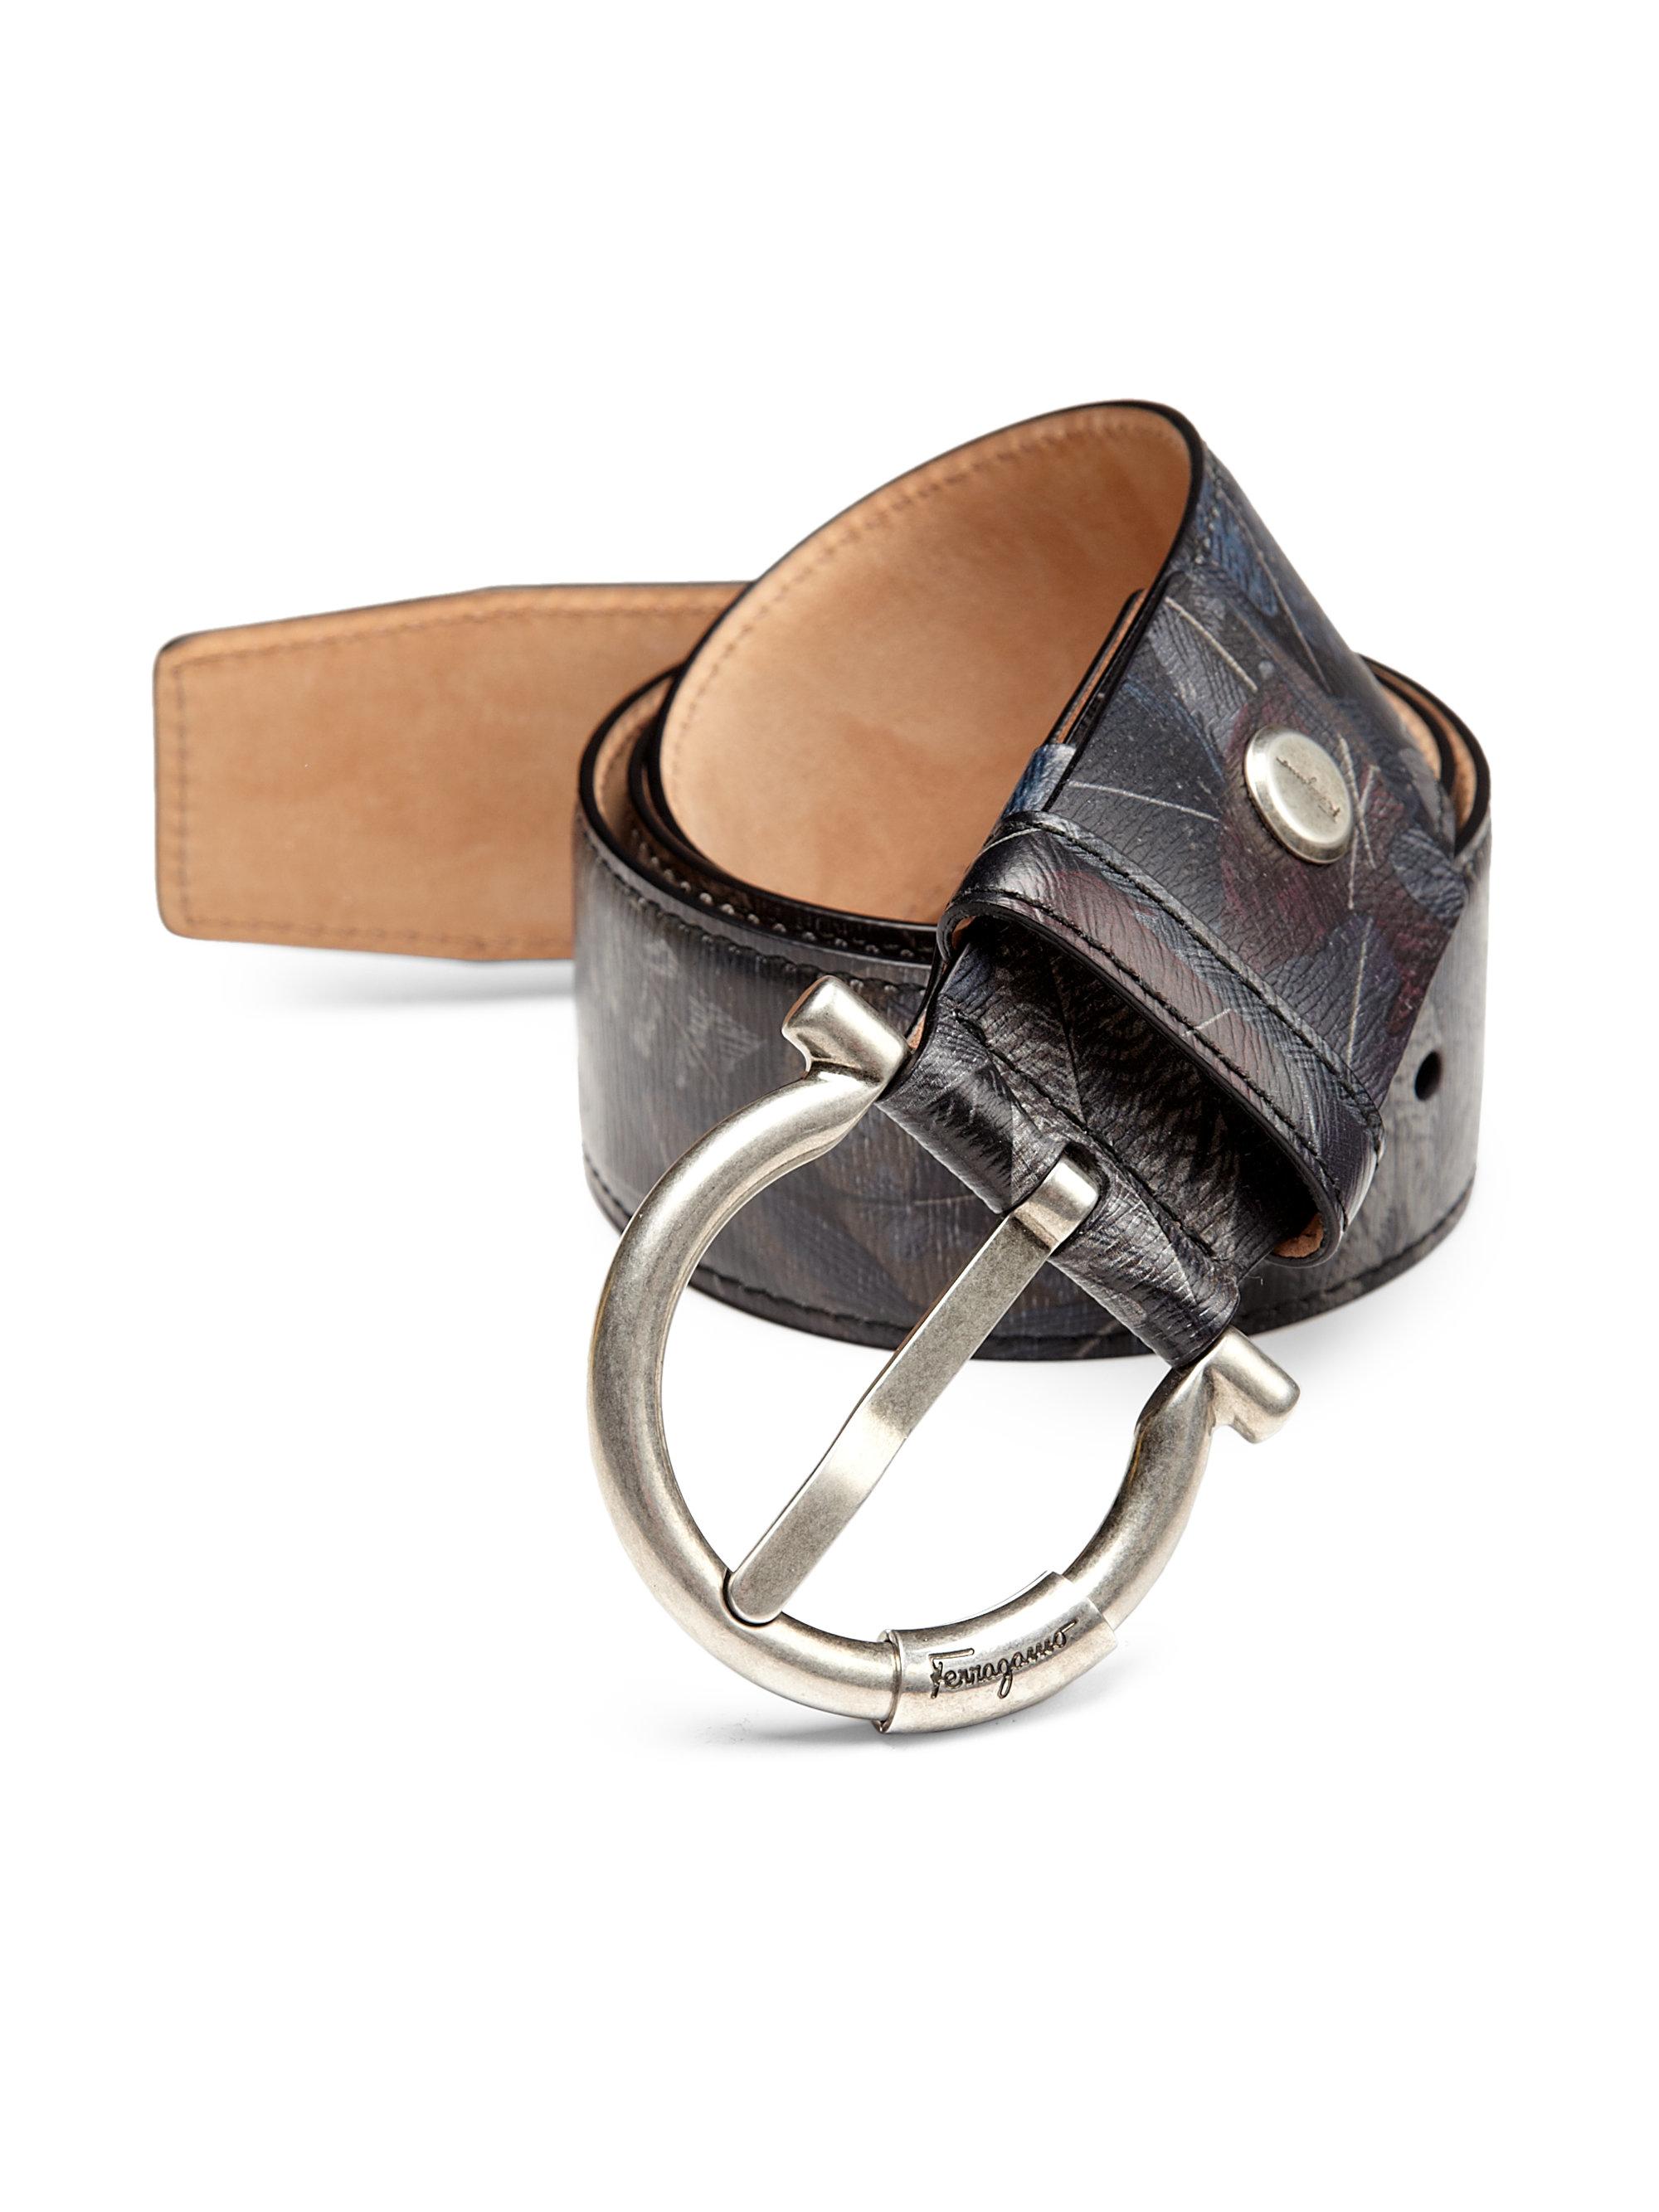 e6b64dbb48bff ... aliexpress lyst ferragamo piume adjustable feather print leather belt  for men 642be 0cd92